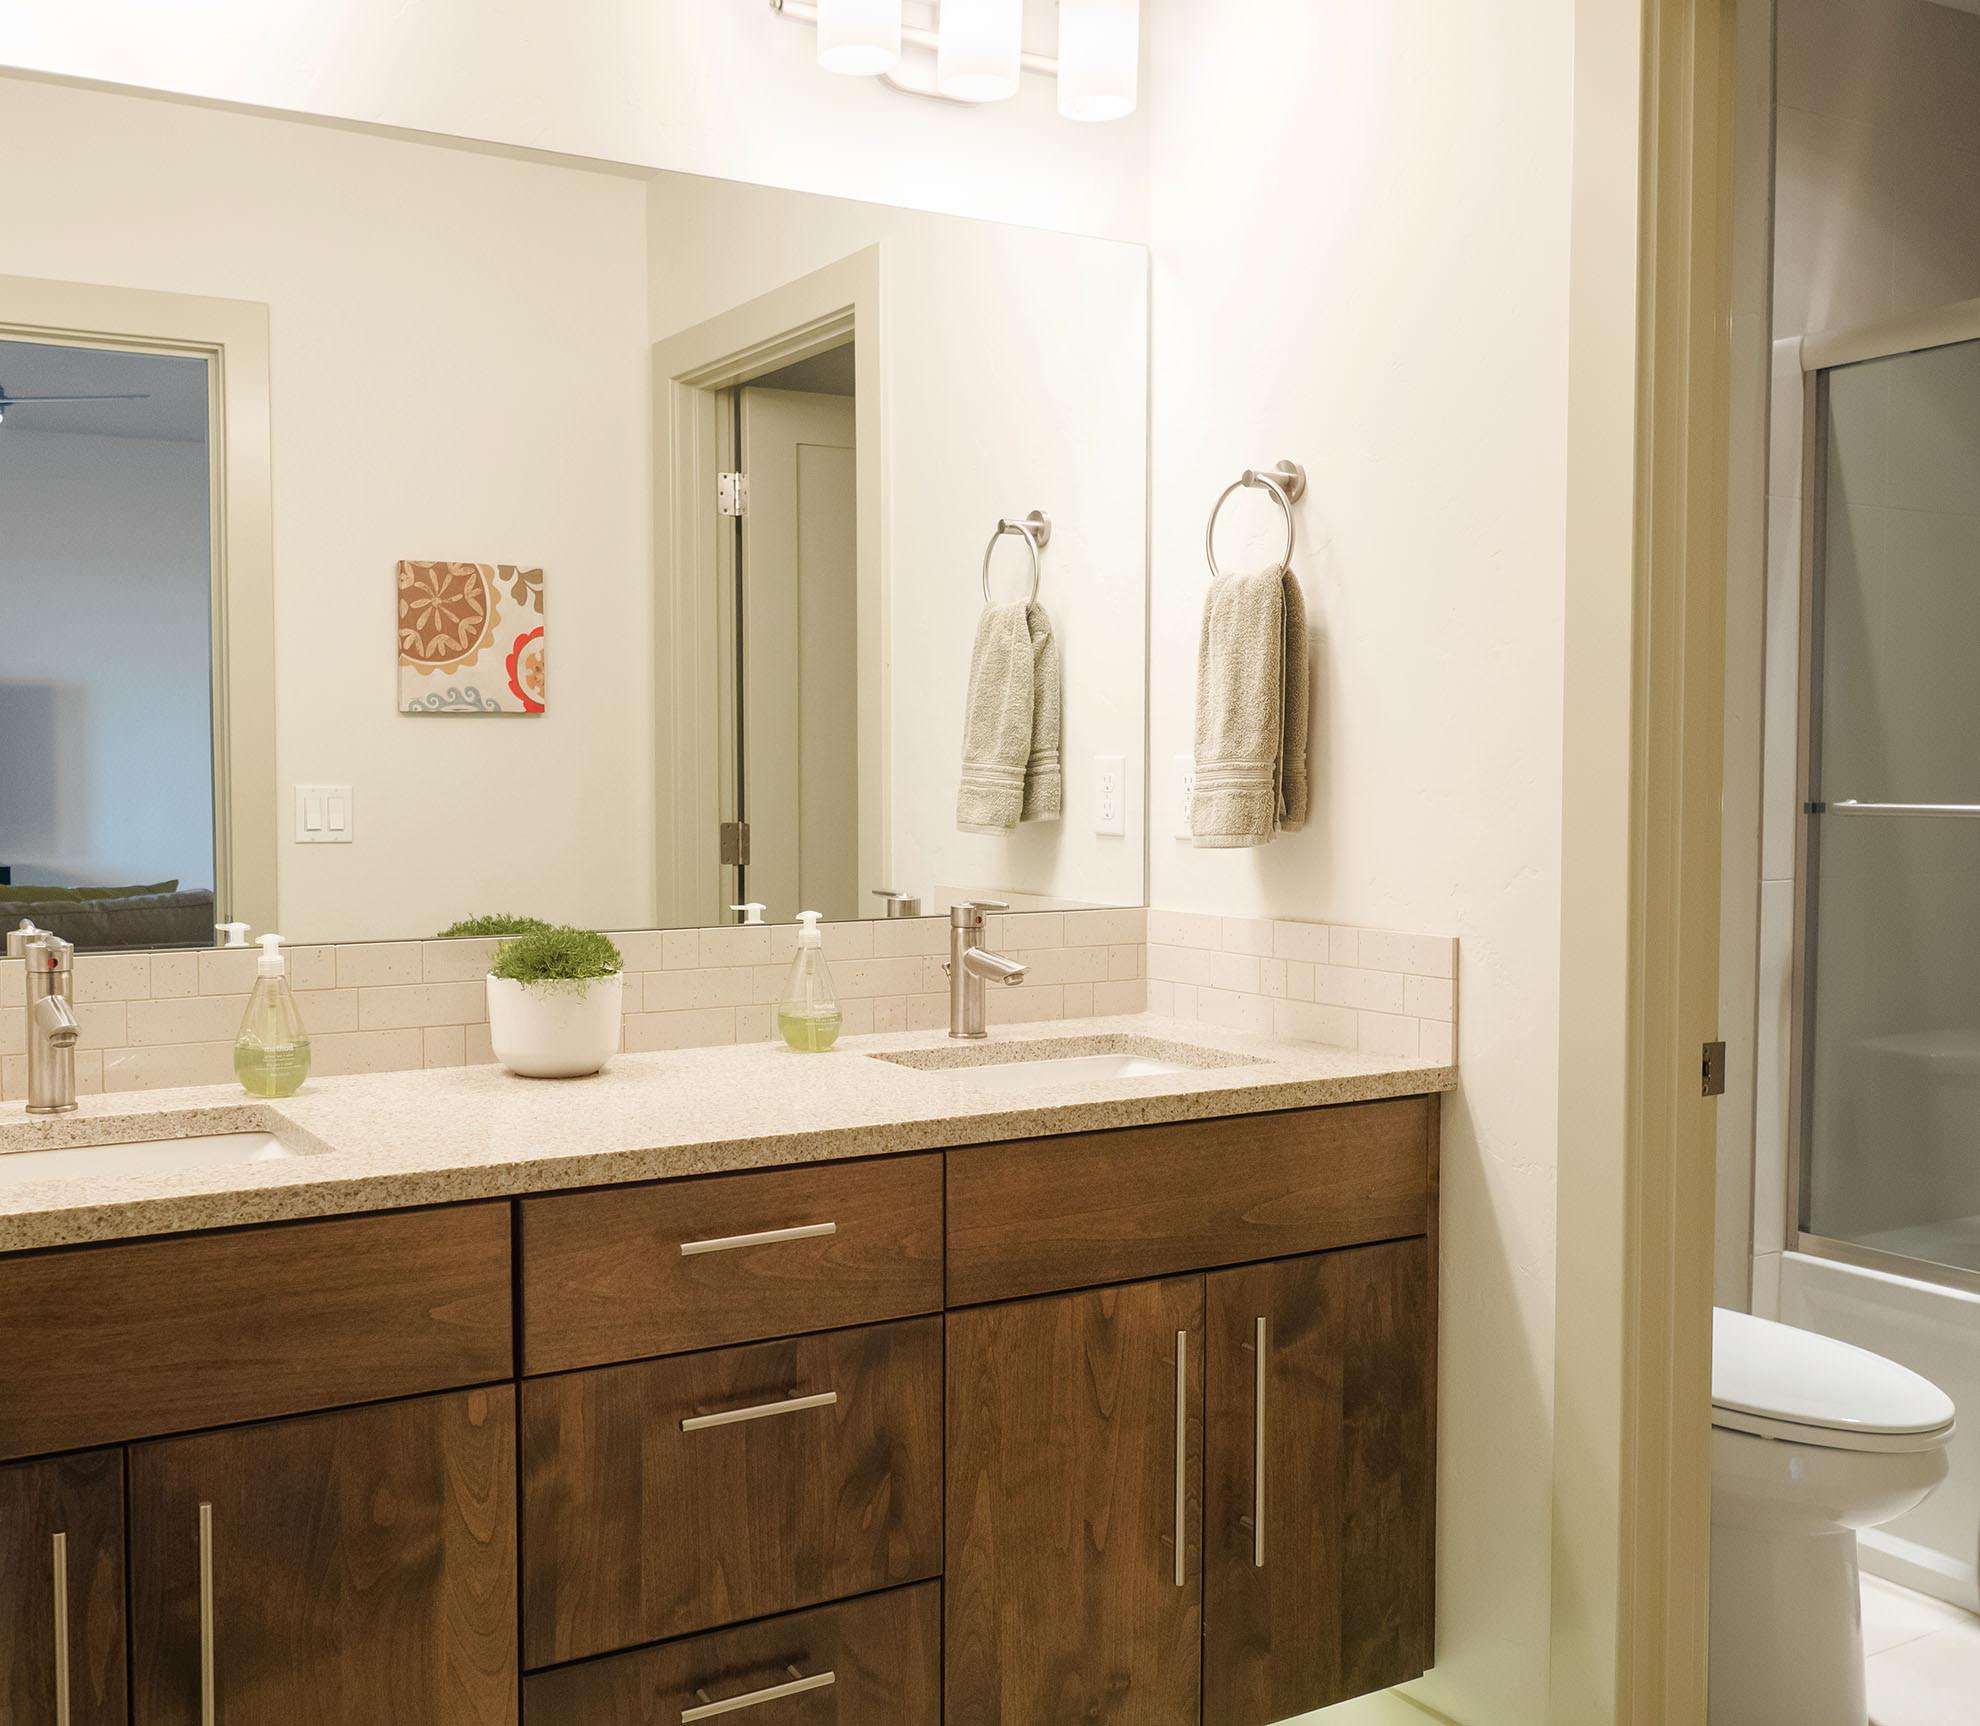 ashlie-rental-lower-bath3.jpg